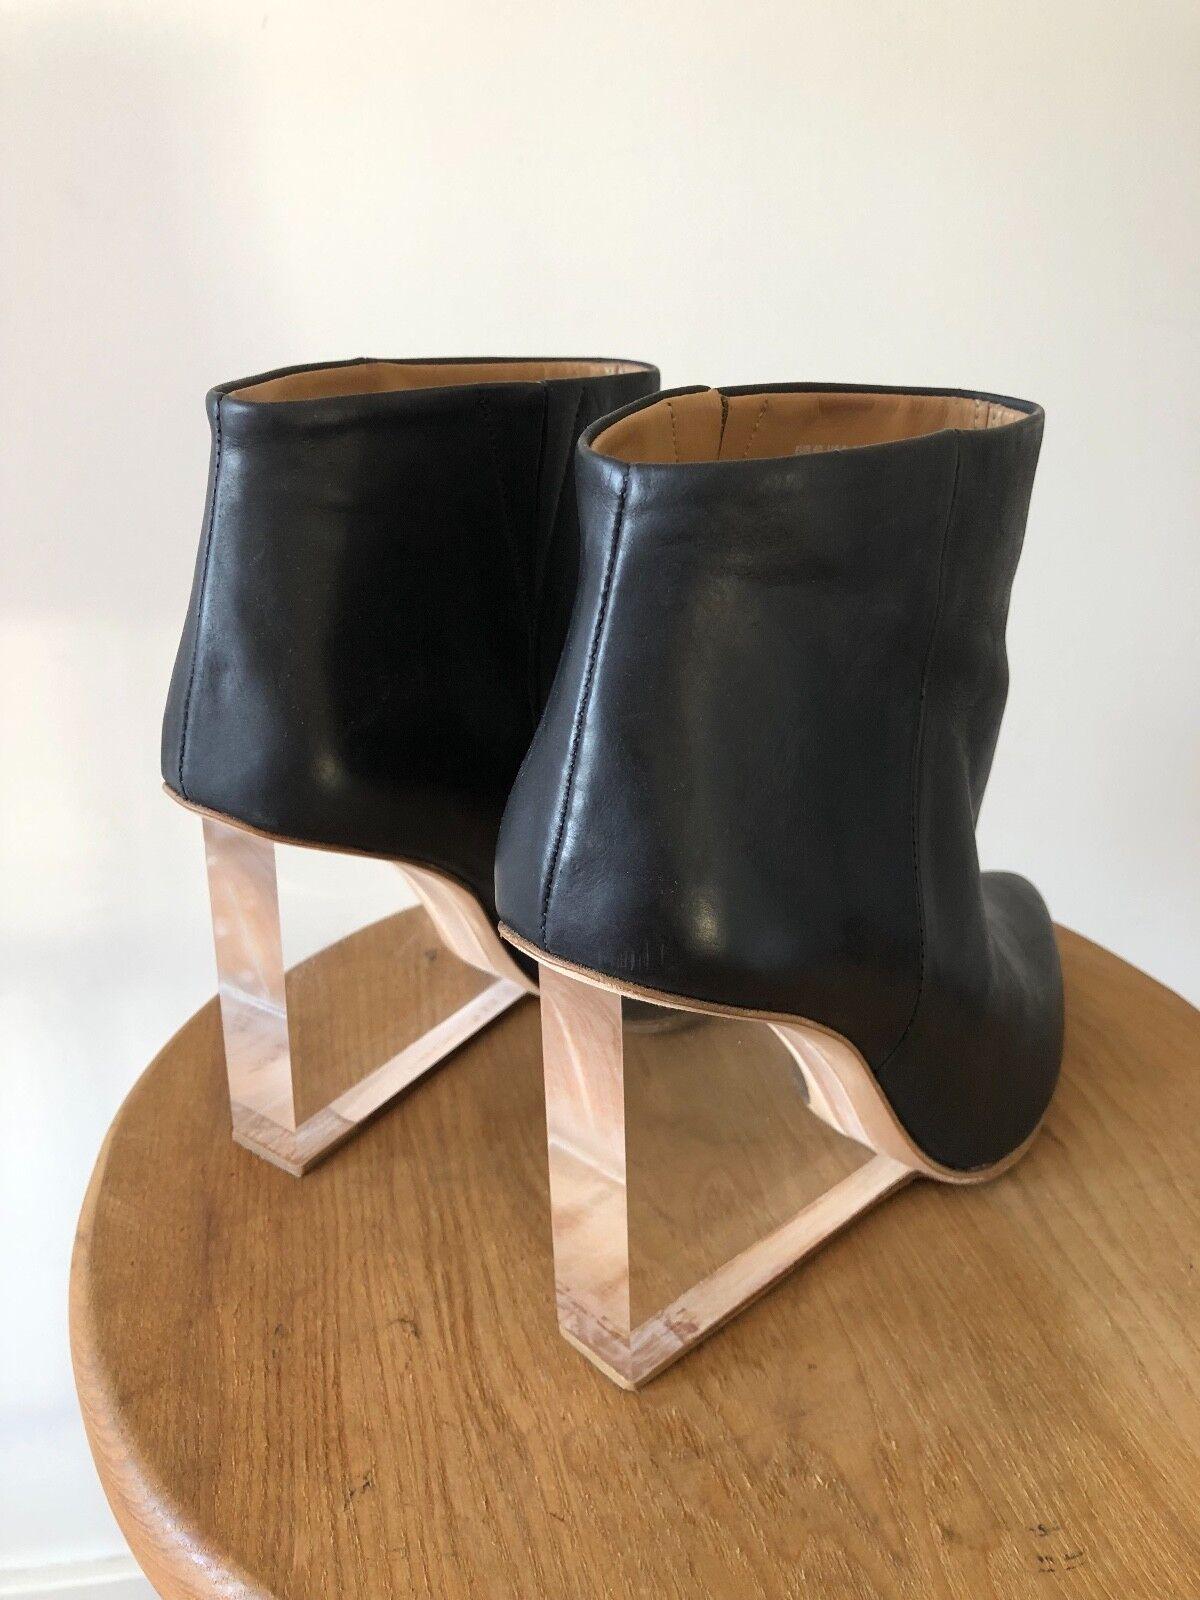 Maison Margiela H&M Clear Lucite Heel Heel Heel Wedge Black Leather Ankle Boots 9 40 UK 7 183438